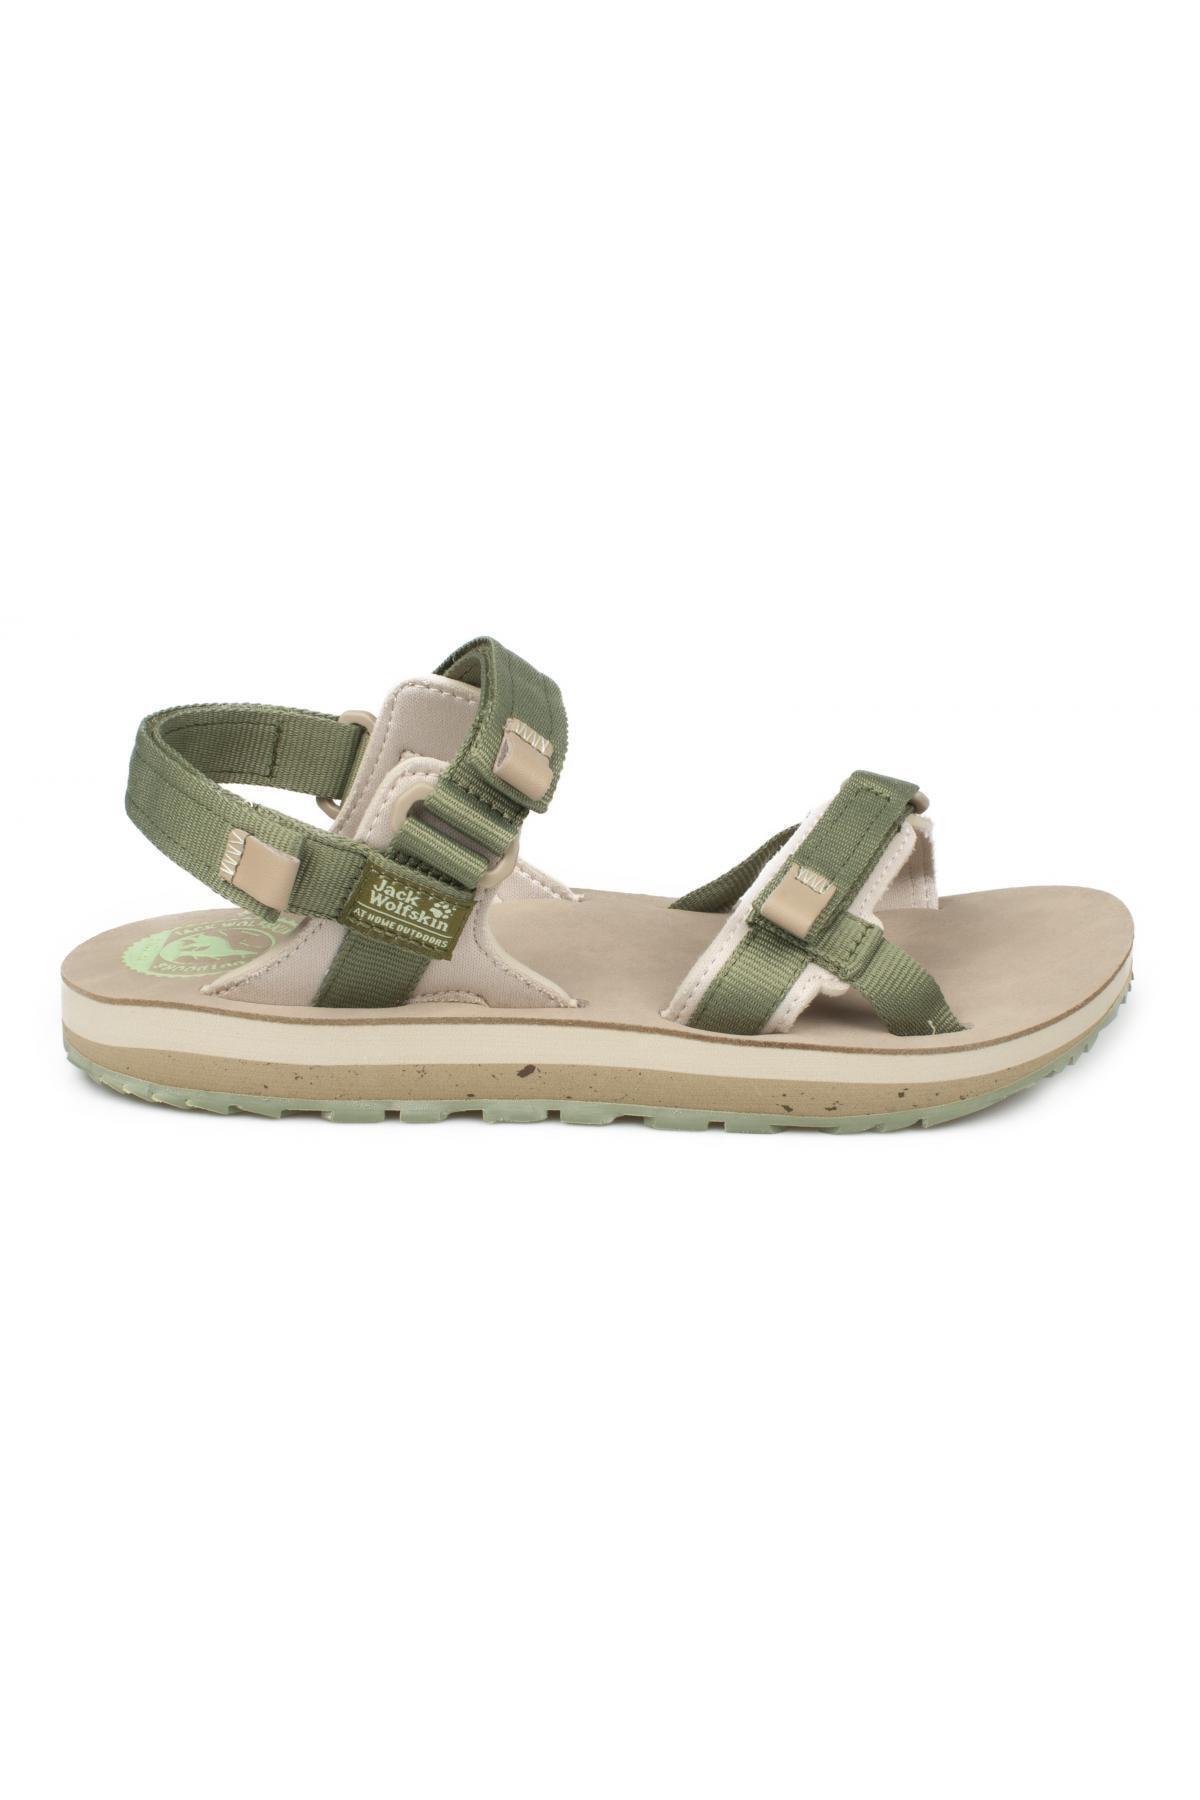 Jack Wolfskin 4039451 Z Outfresh Deluxe Sandal W Kadın Sandalet 2